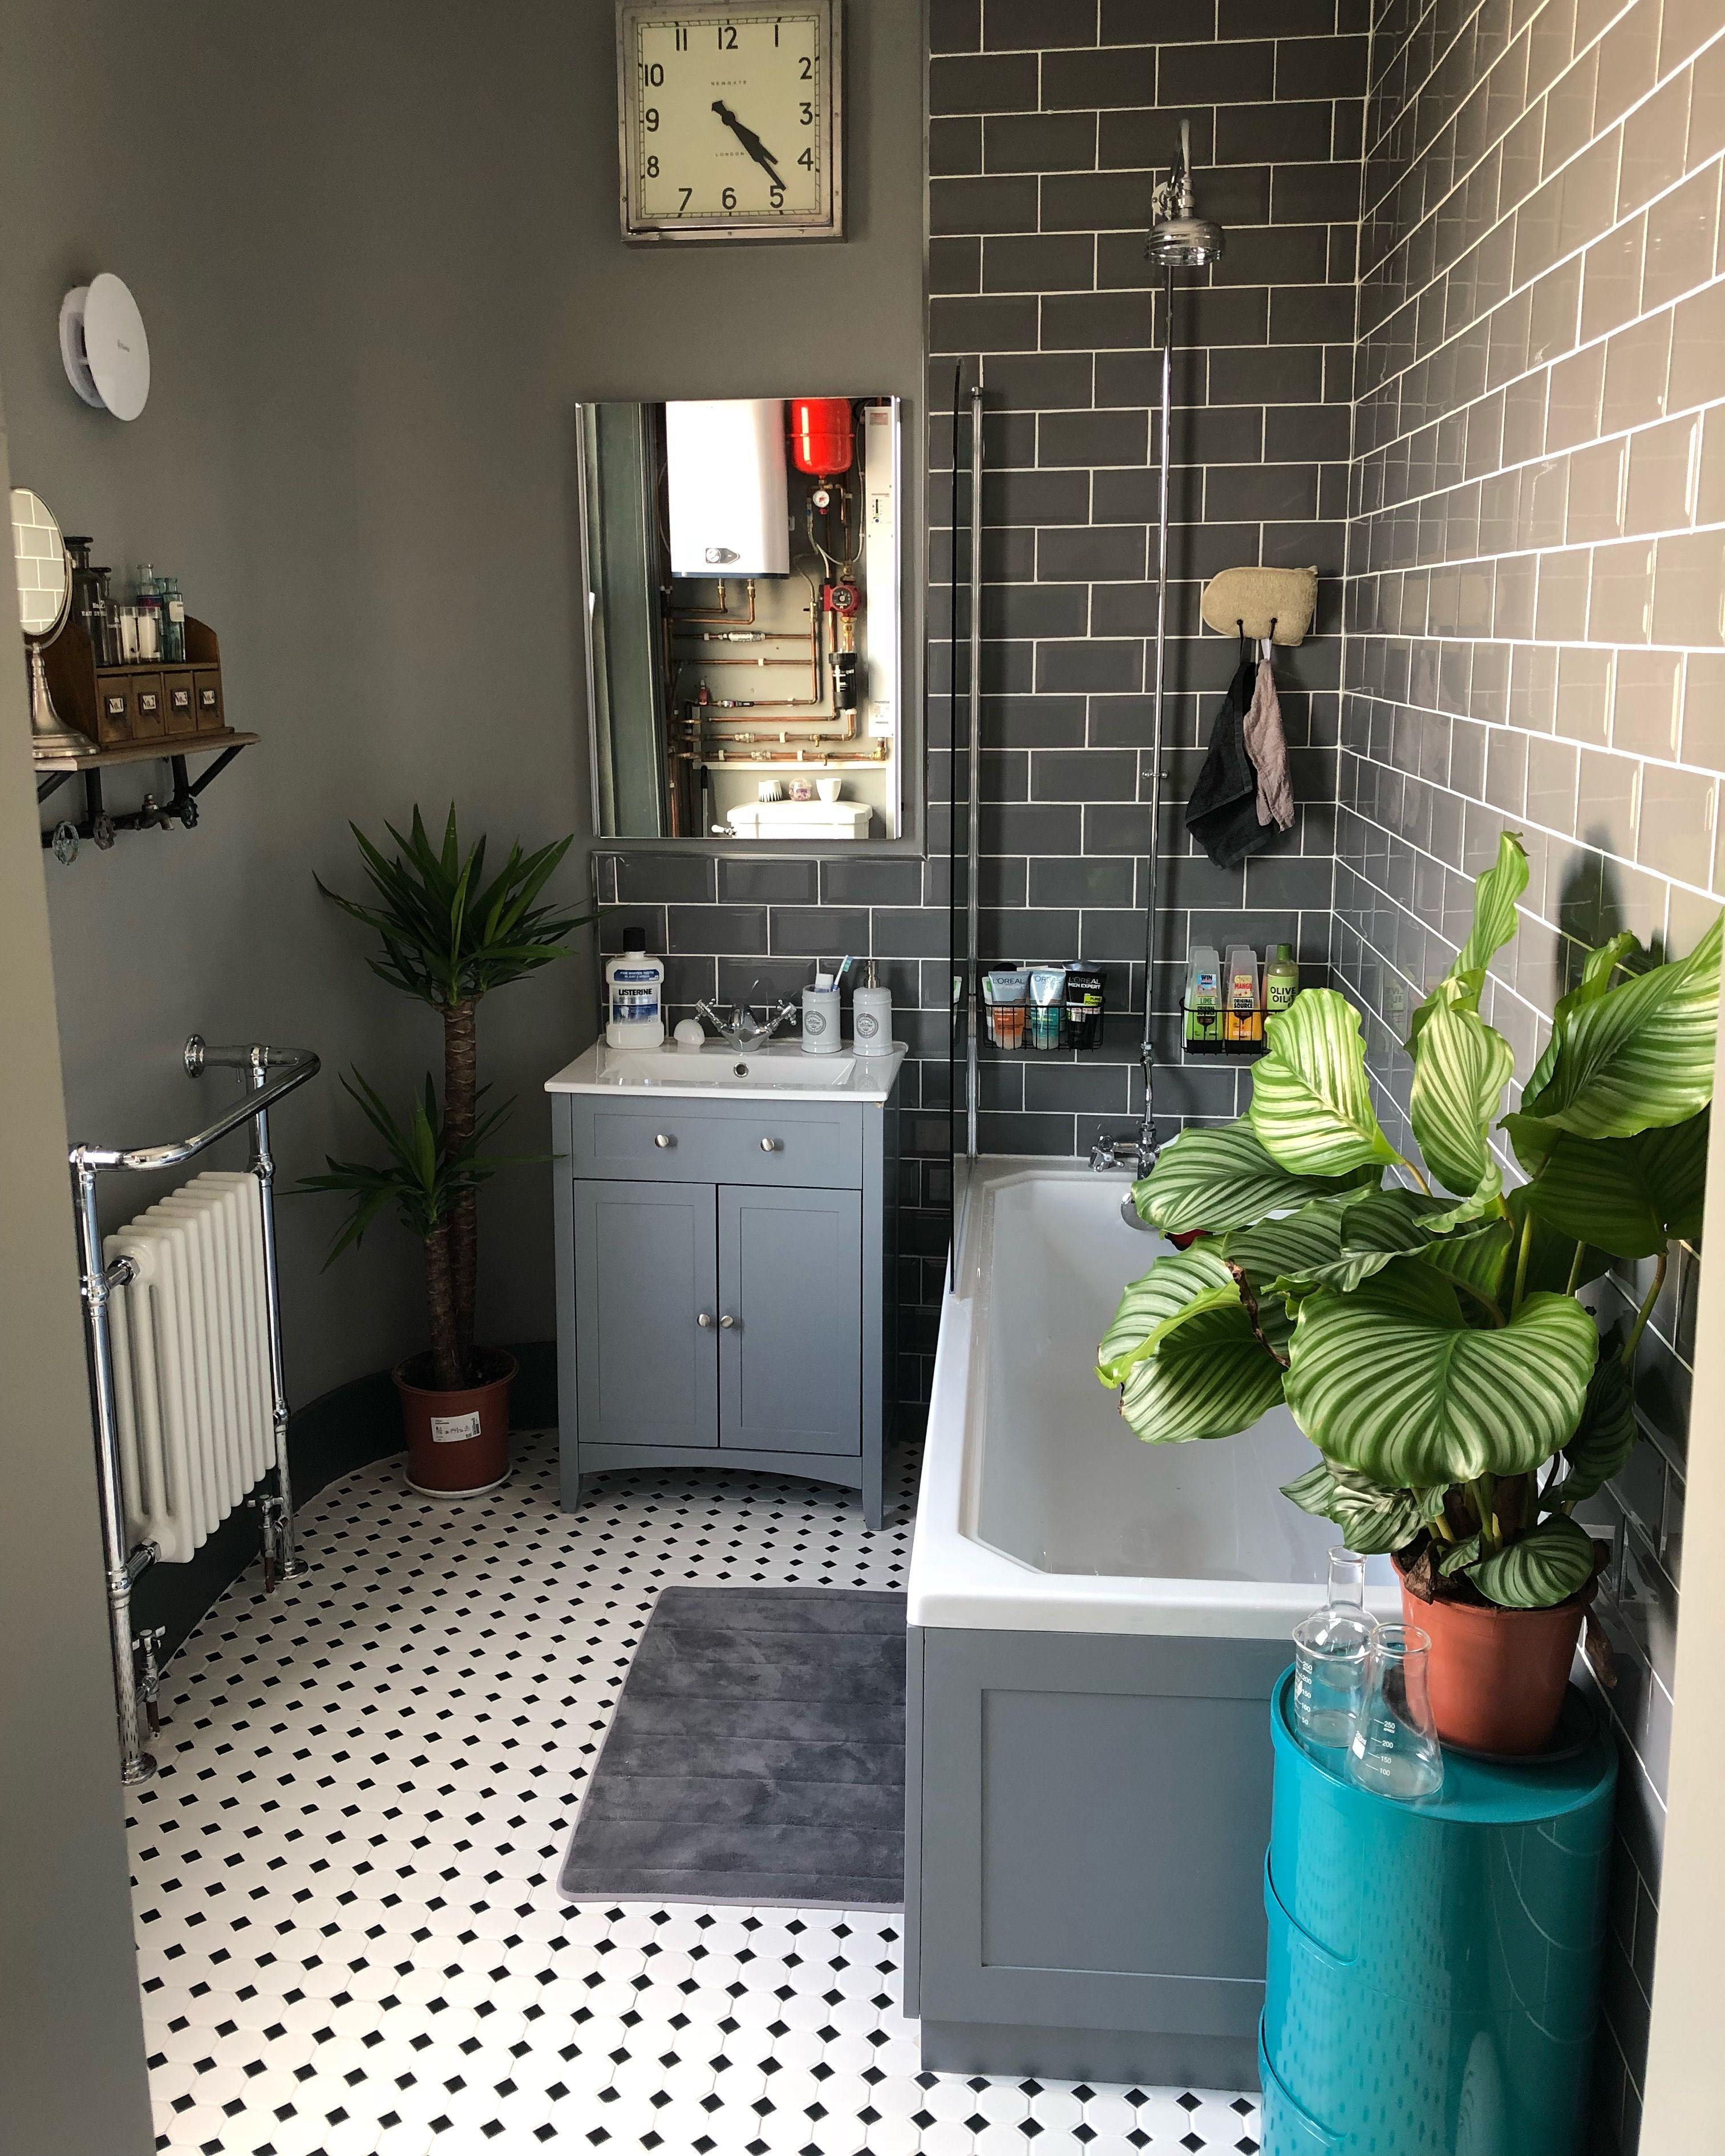 Victoria Plum Bathroom Wall Tiles Topps Tiles Floor Tiles Walls In Farrow Ball S Manor House Grey Newgate Bathroom Wall Tile Bathroom Style Shower Room